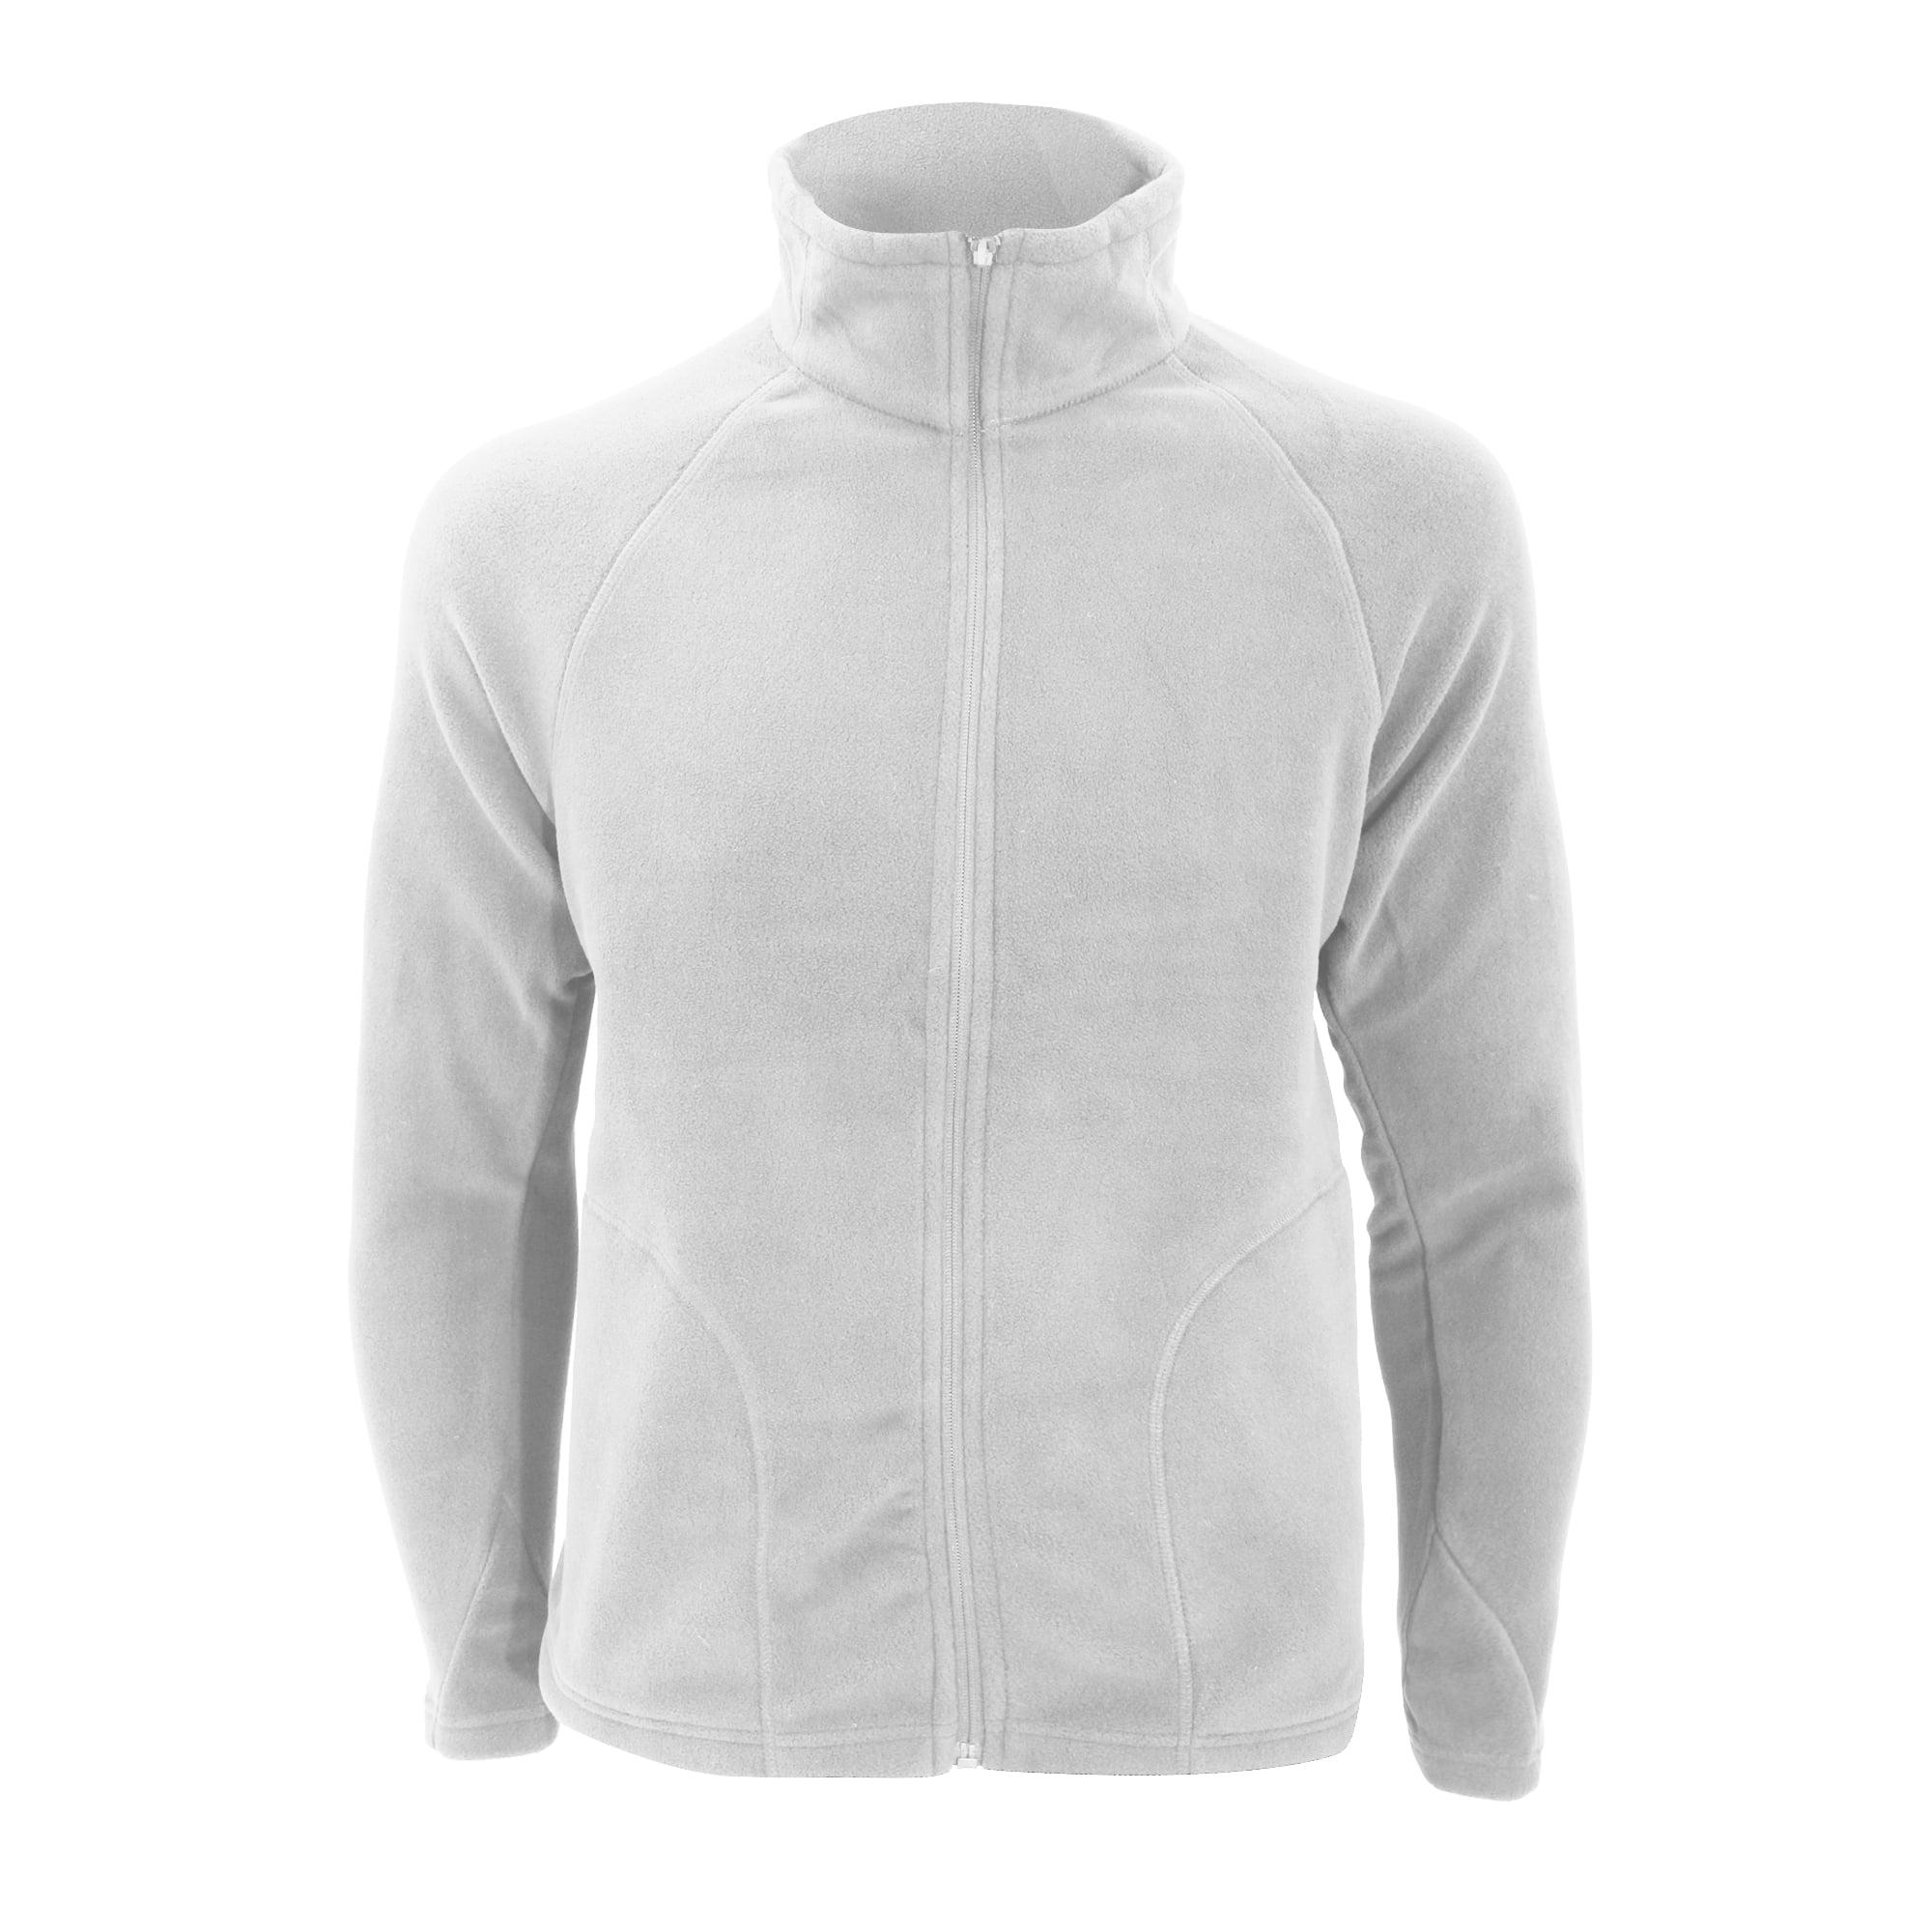 Micron Fleece-Mid capa topresult Core